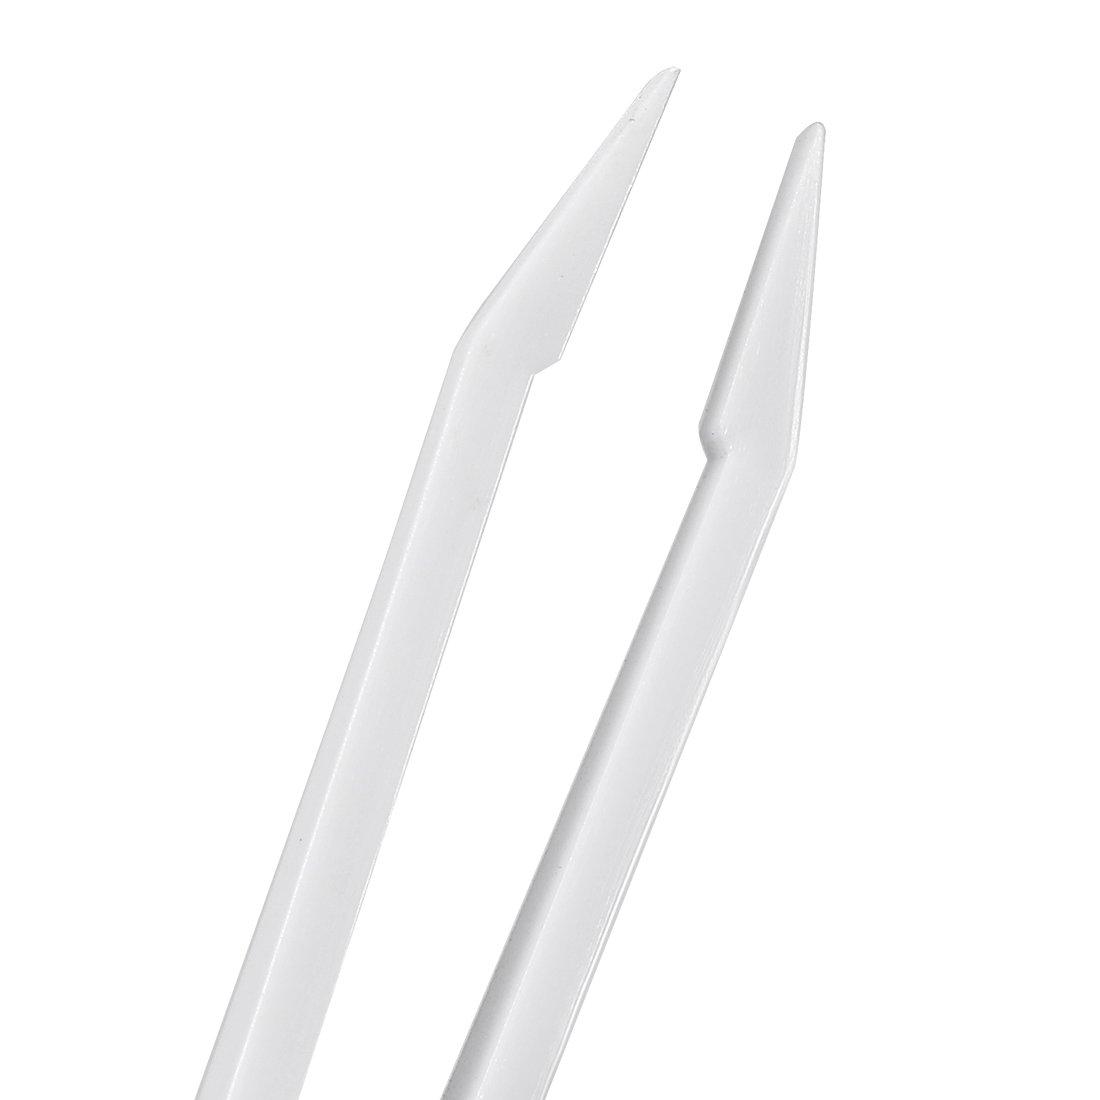 sourcingmap Black Plastic Curved Tip Anti-Static Tweezers 4.7 Inch Length 5pcs